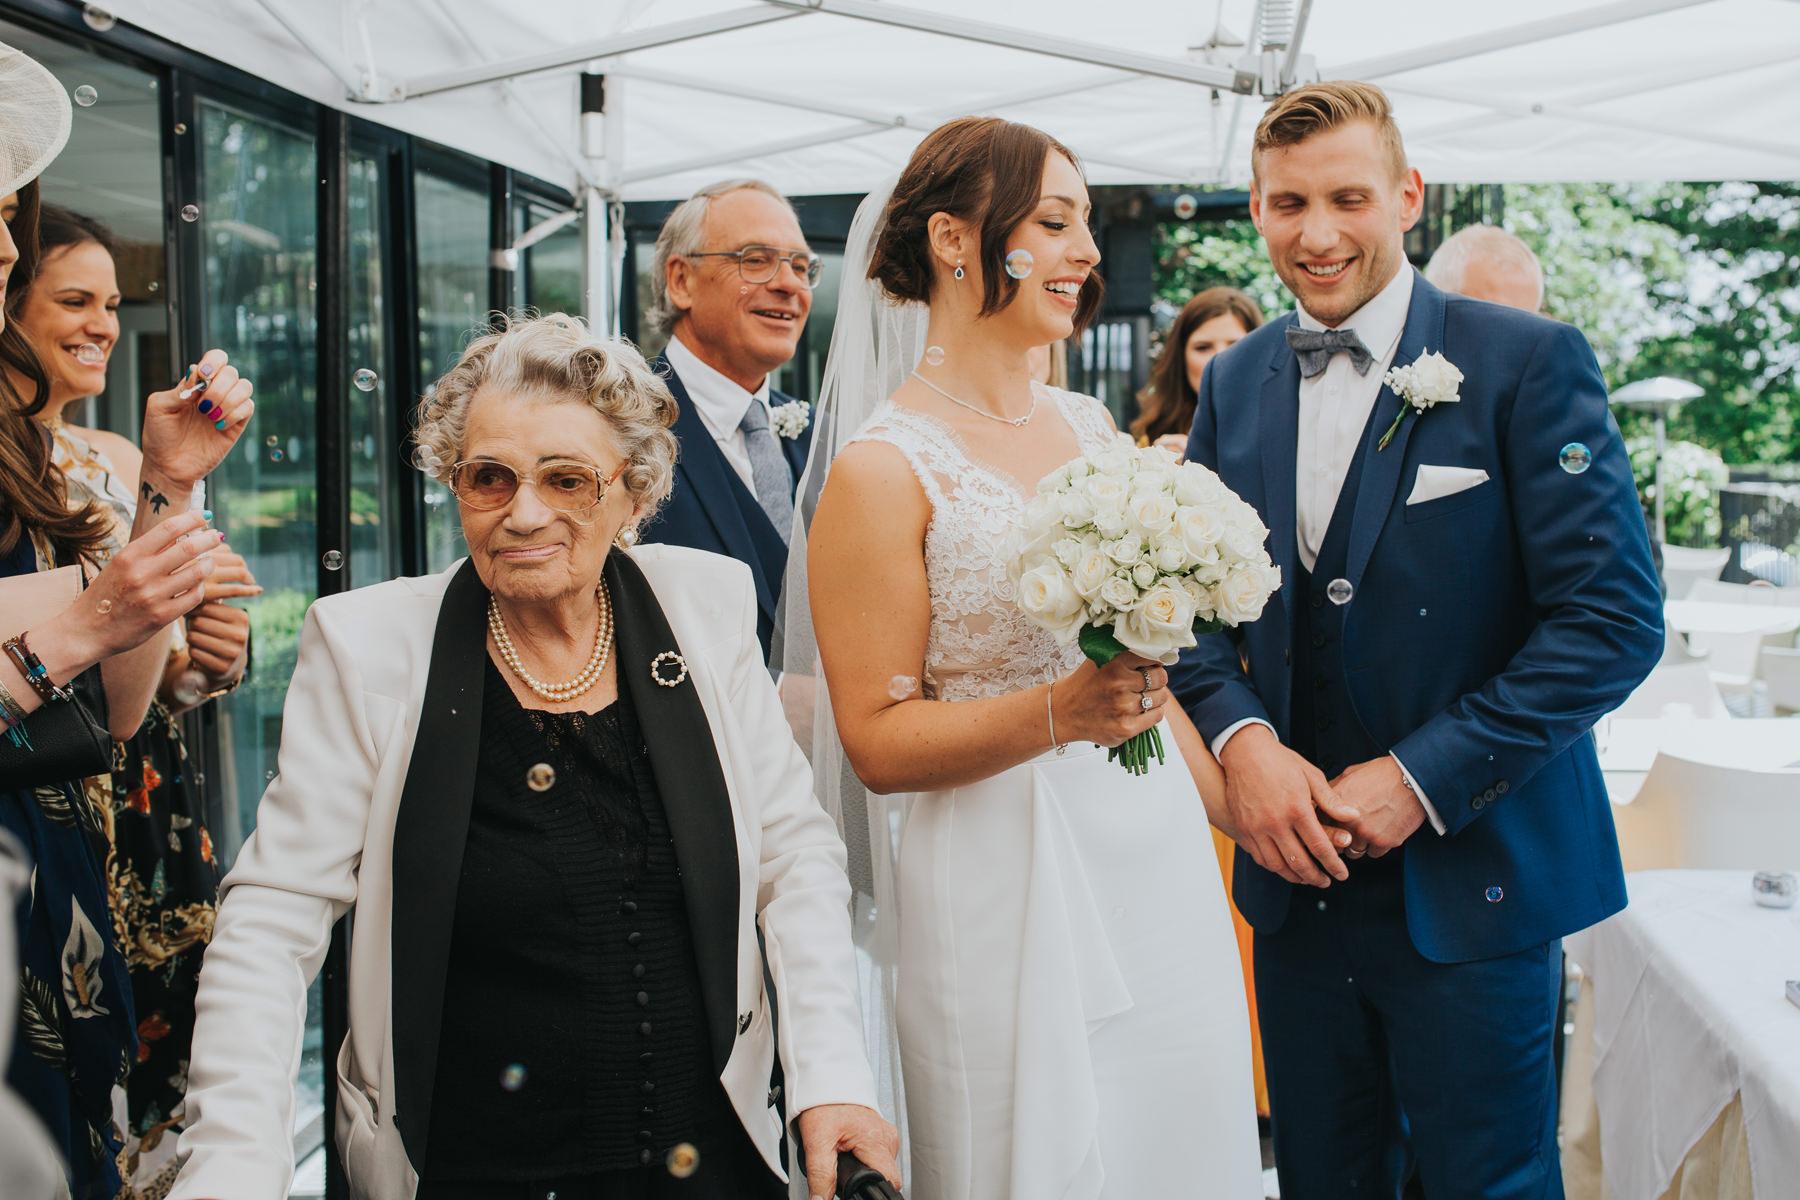 CRL-232-The Bingham Wedding Richmond-groom bride guests blowing bubbles.jpg